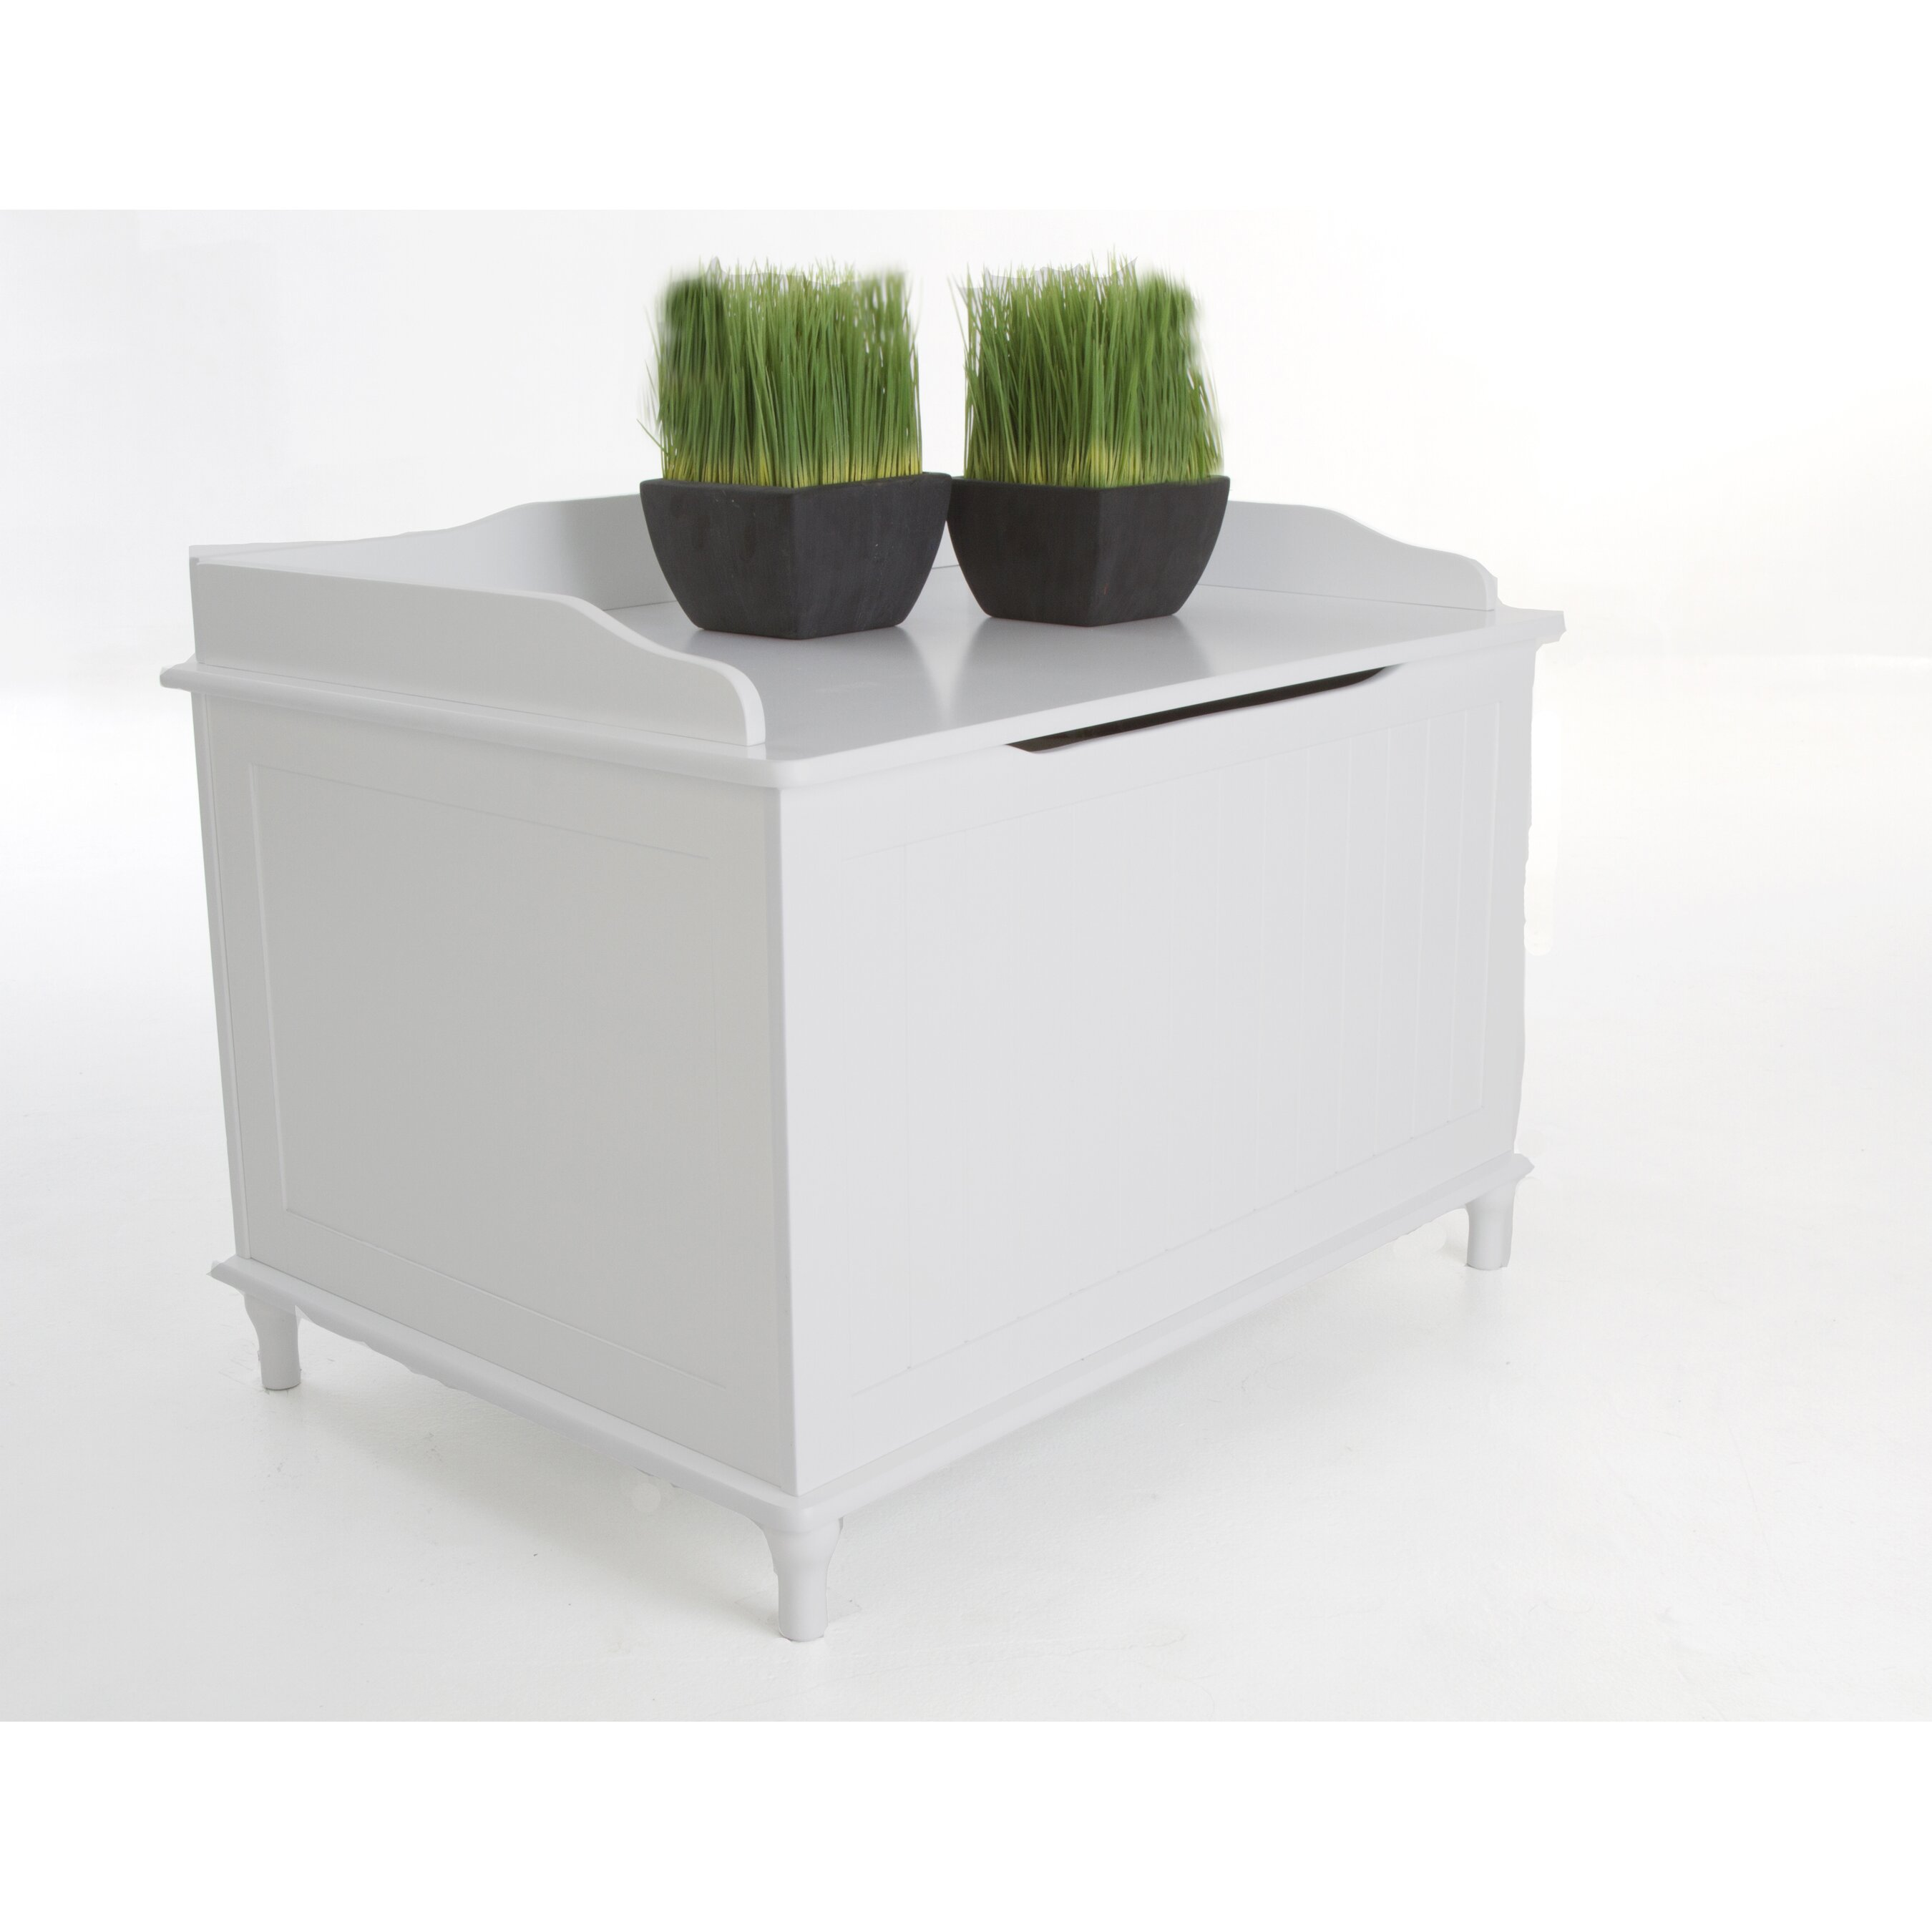 Designer Pet Products Mia Litter Box Enclosure Amp Reviews